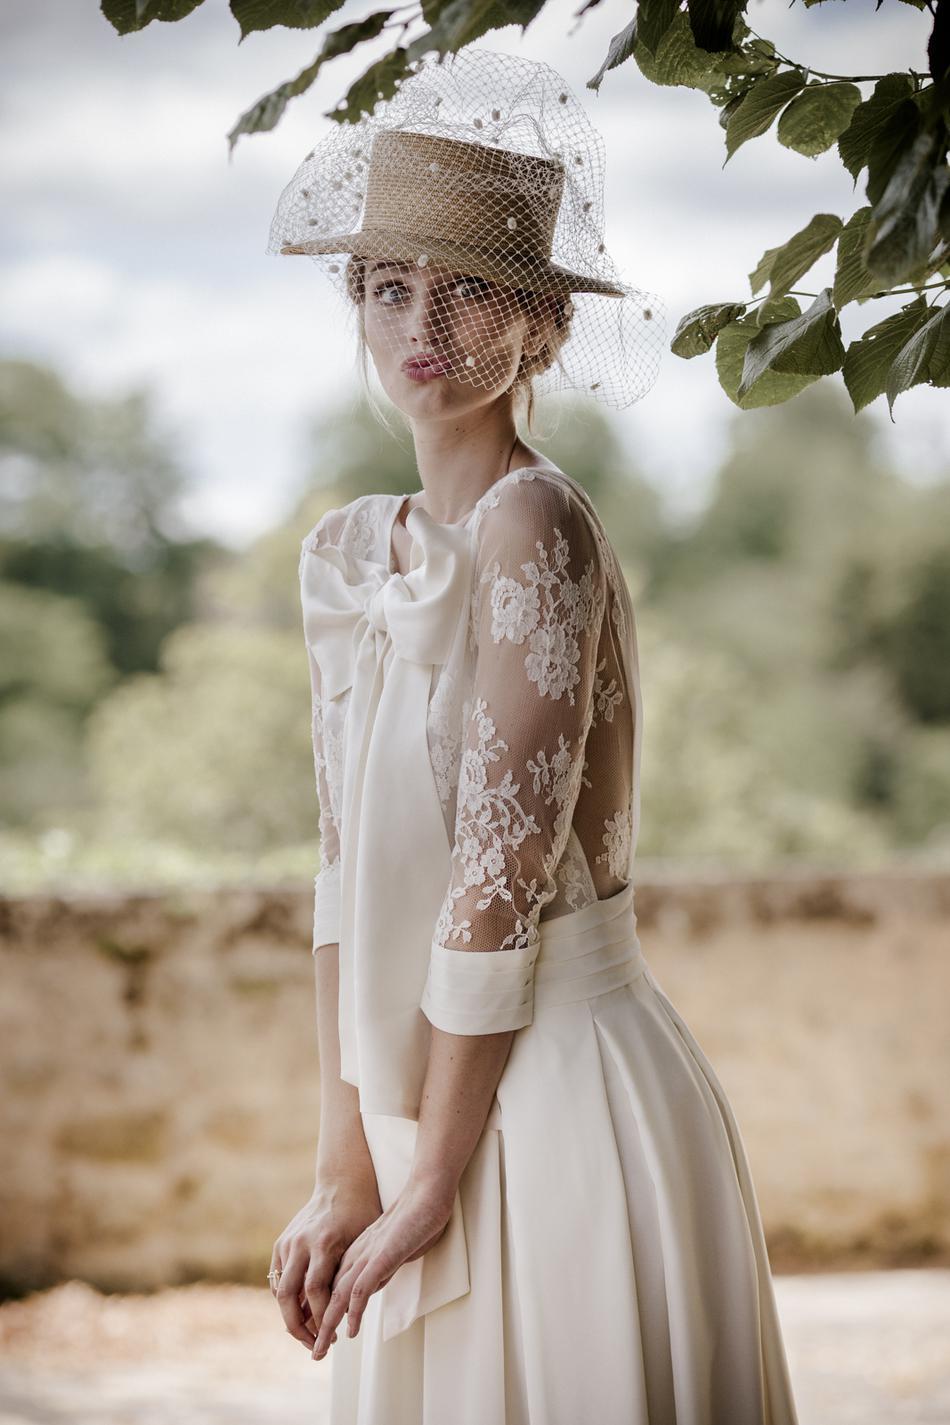 caractéristiques exceptionnelles mode designer pas cher The French Touch: Chapeau to the Lovely Bride